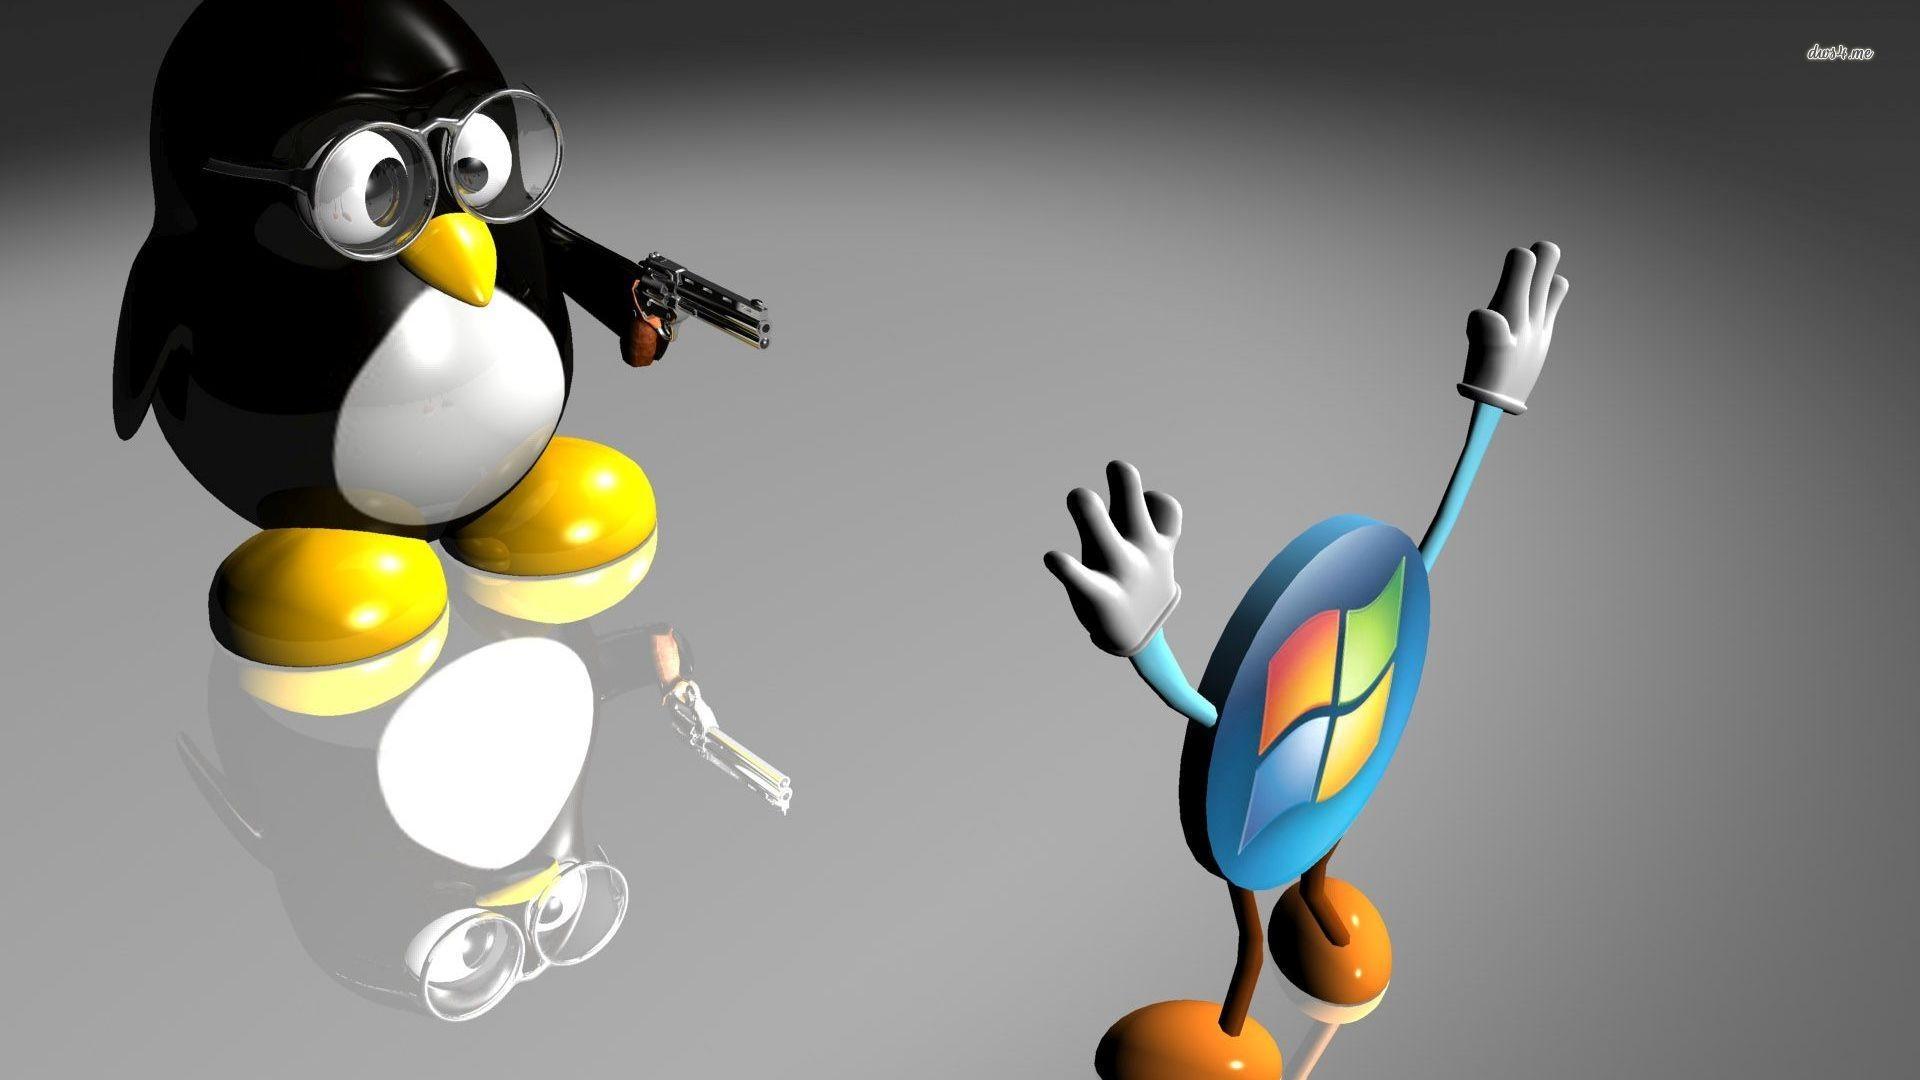 Wallpaper Linux vs Windows ·① WallpaperTag